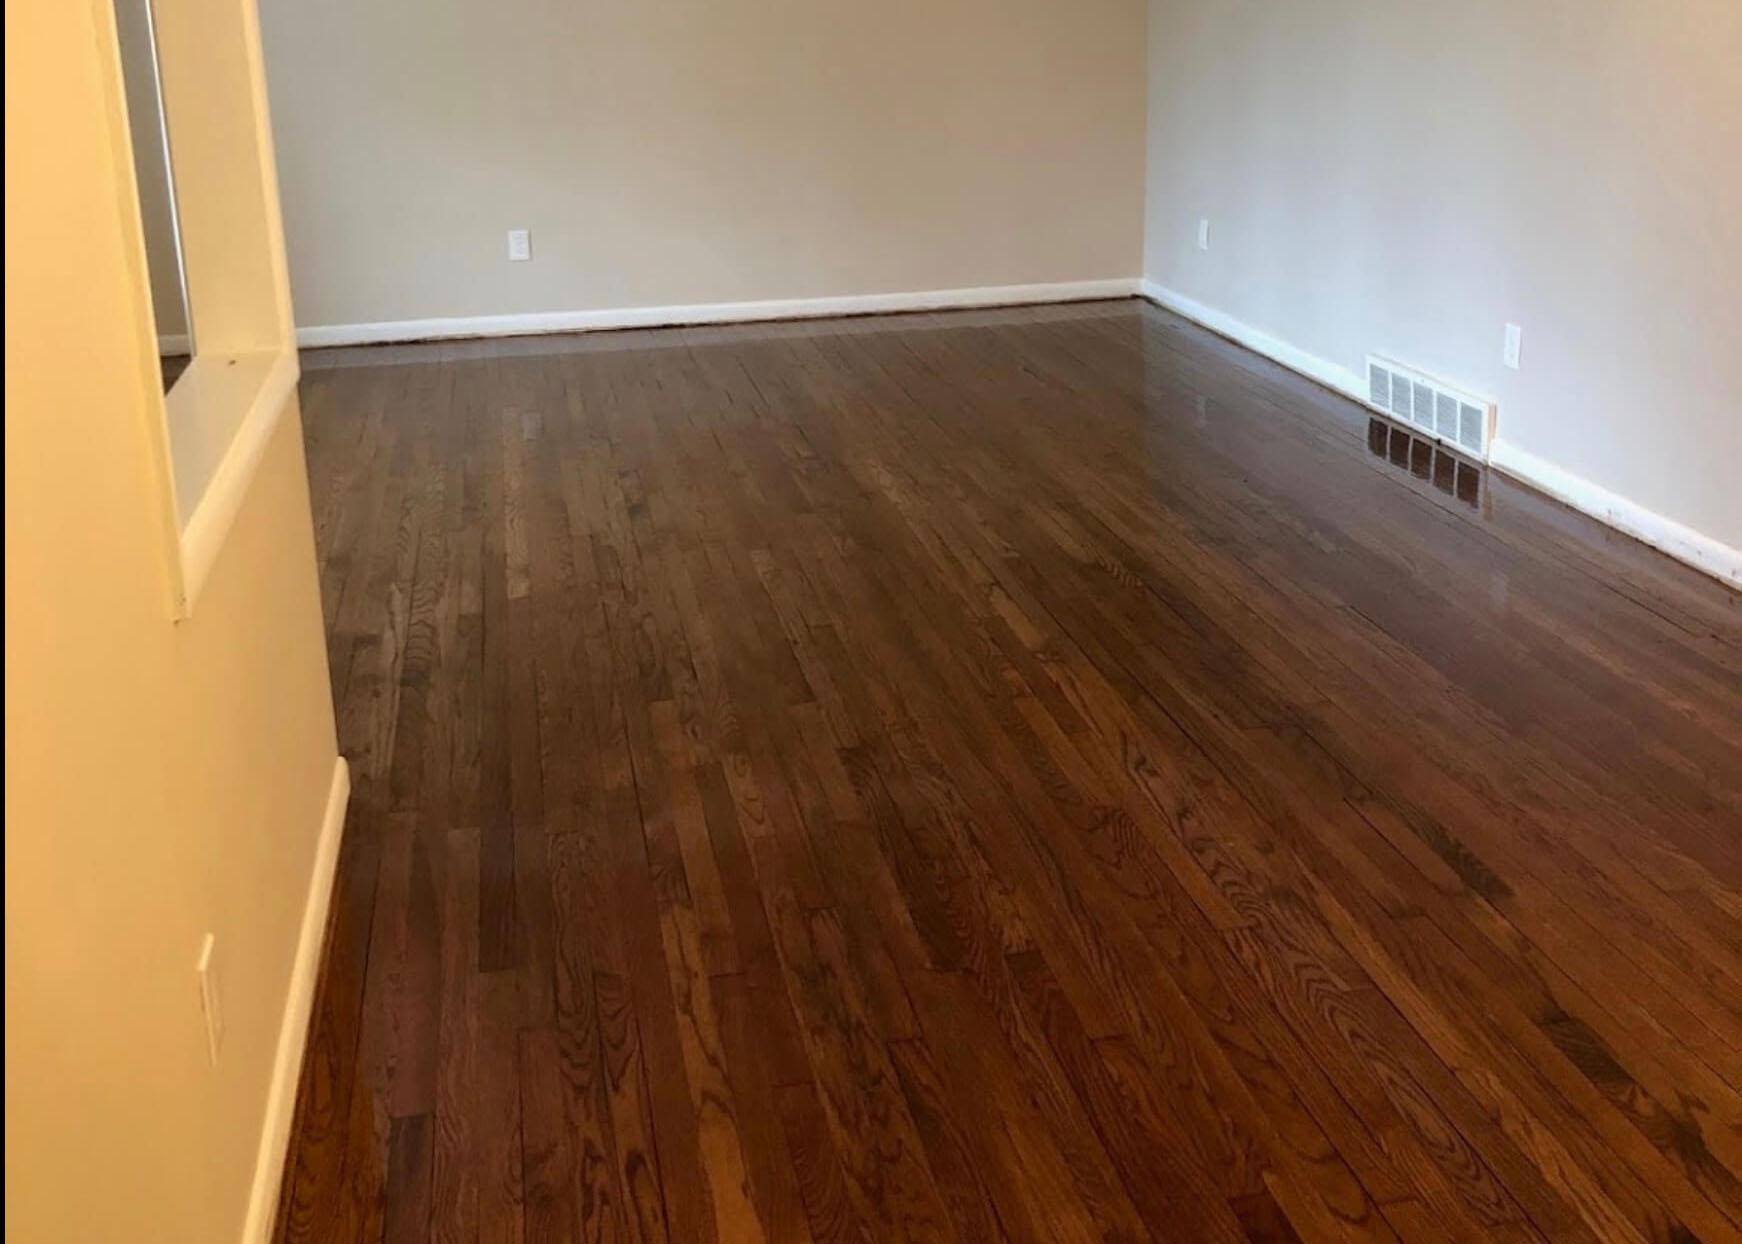 after wood floor resurfacing